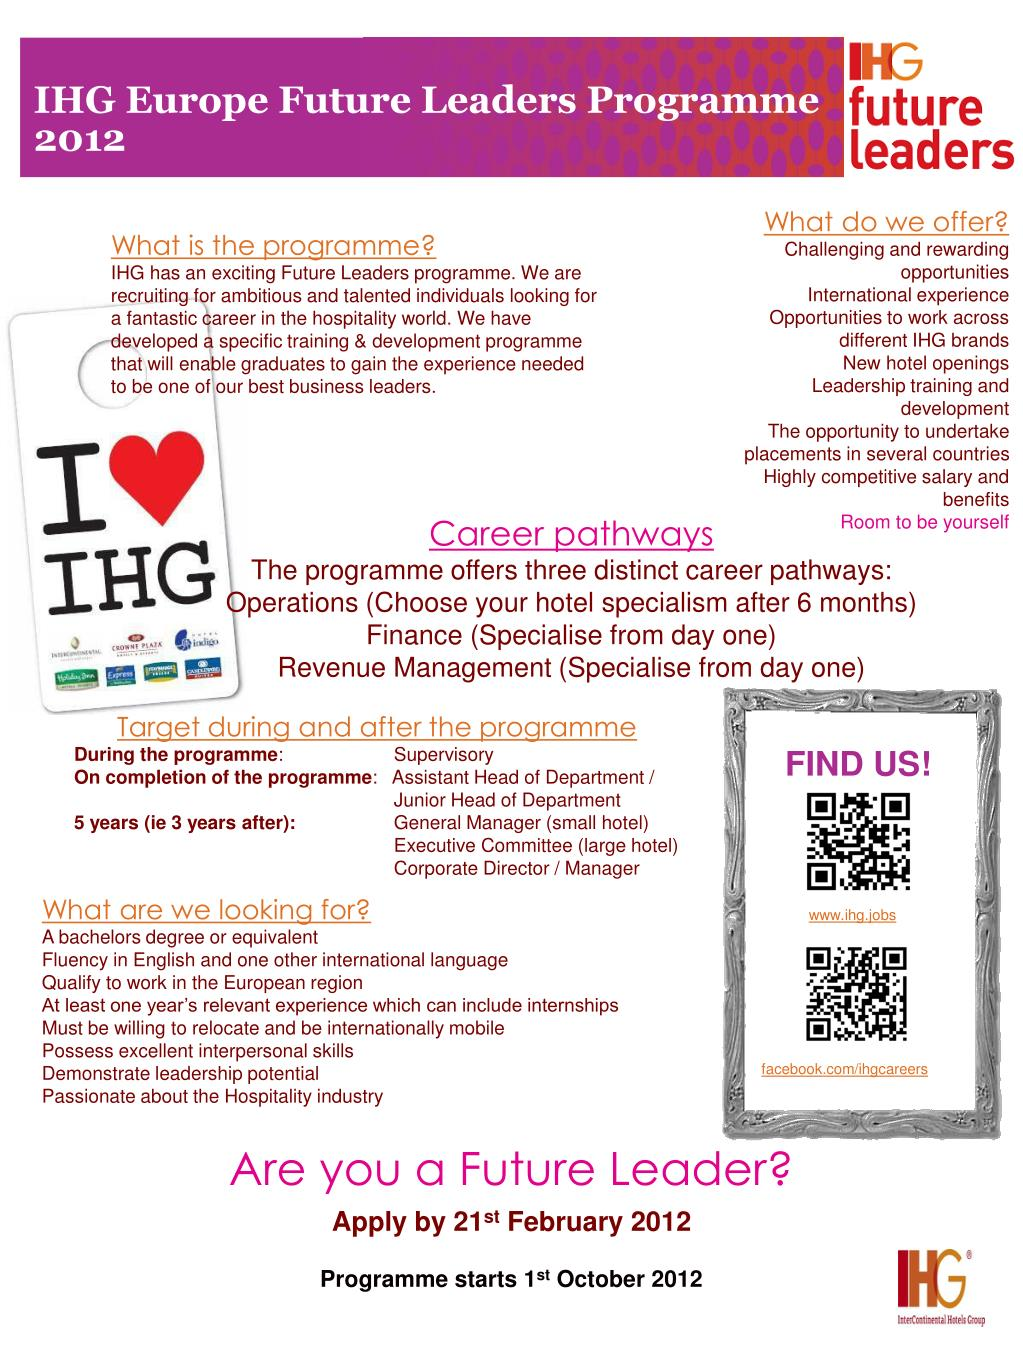 PPT - IHG Europe Future Leaders Programme 2012 PowerPoint